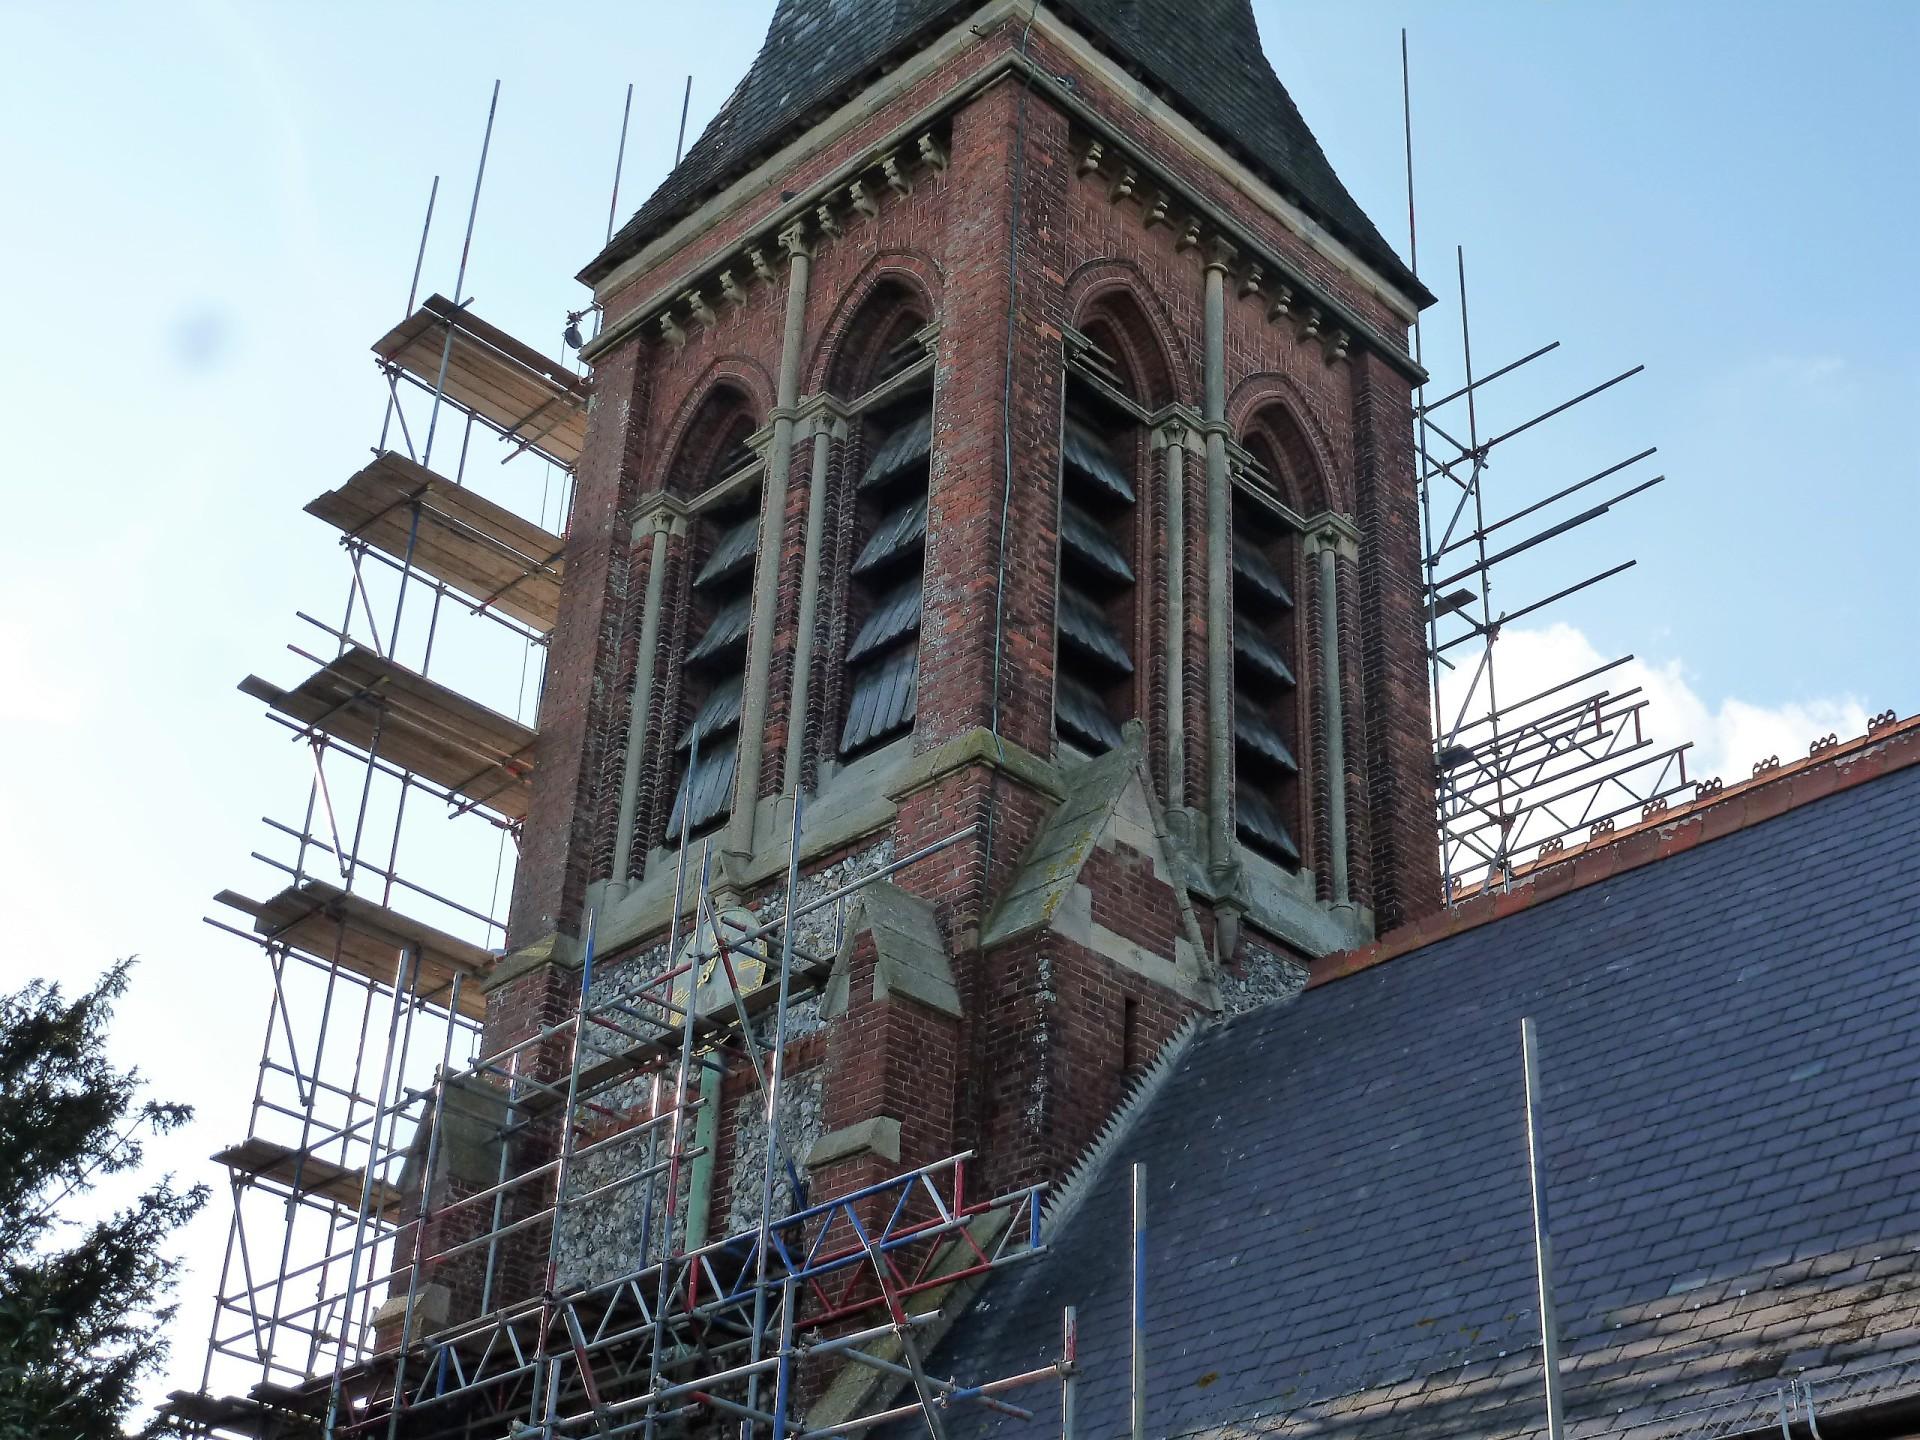 St. Botolph's, Heene, scaffolding 16.5.16